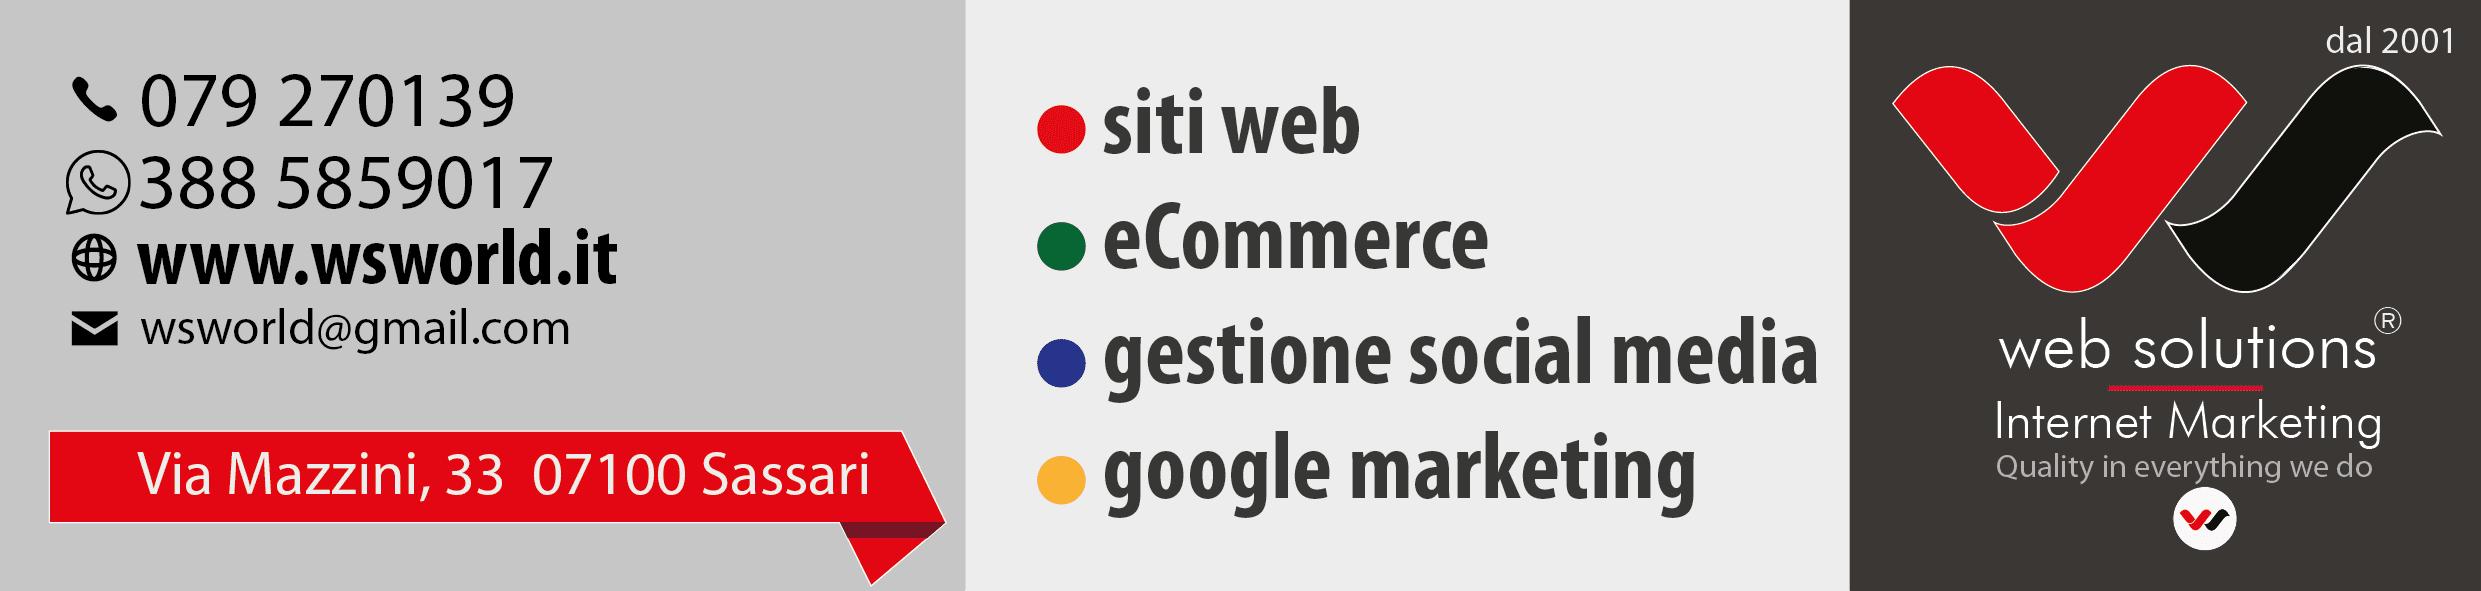 Web Solutions internet marketing in Sardegna